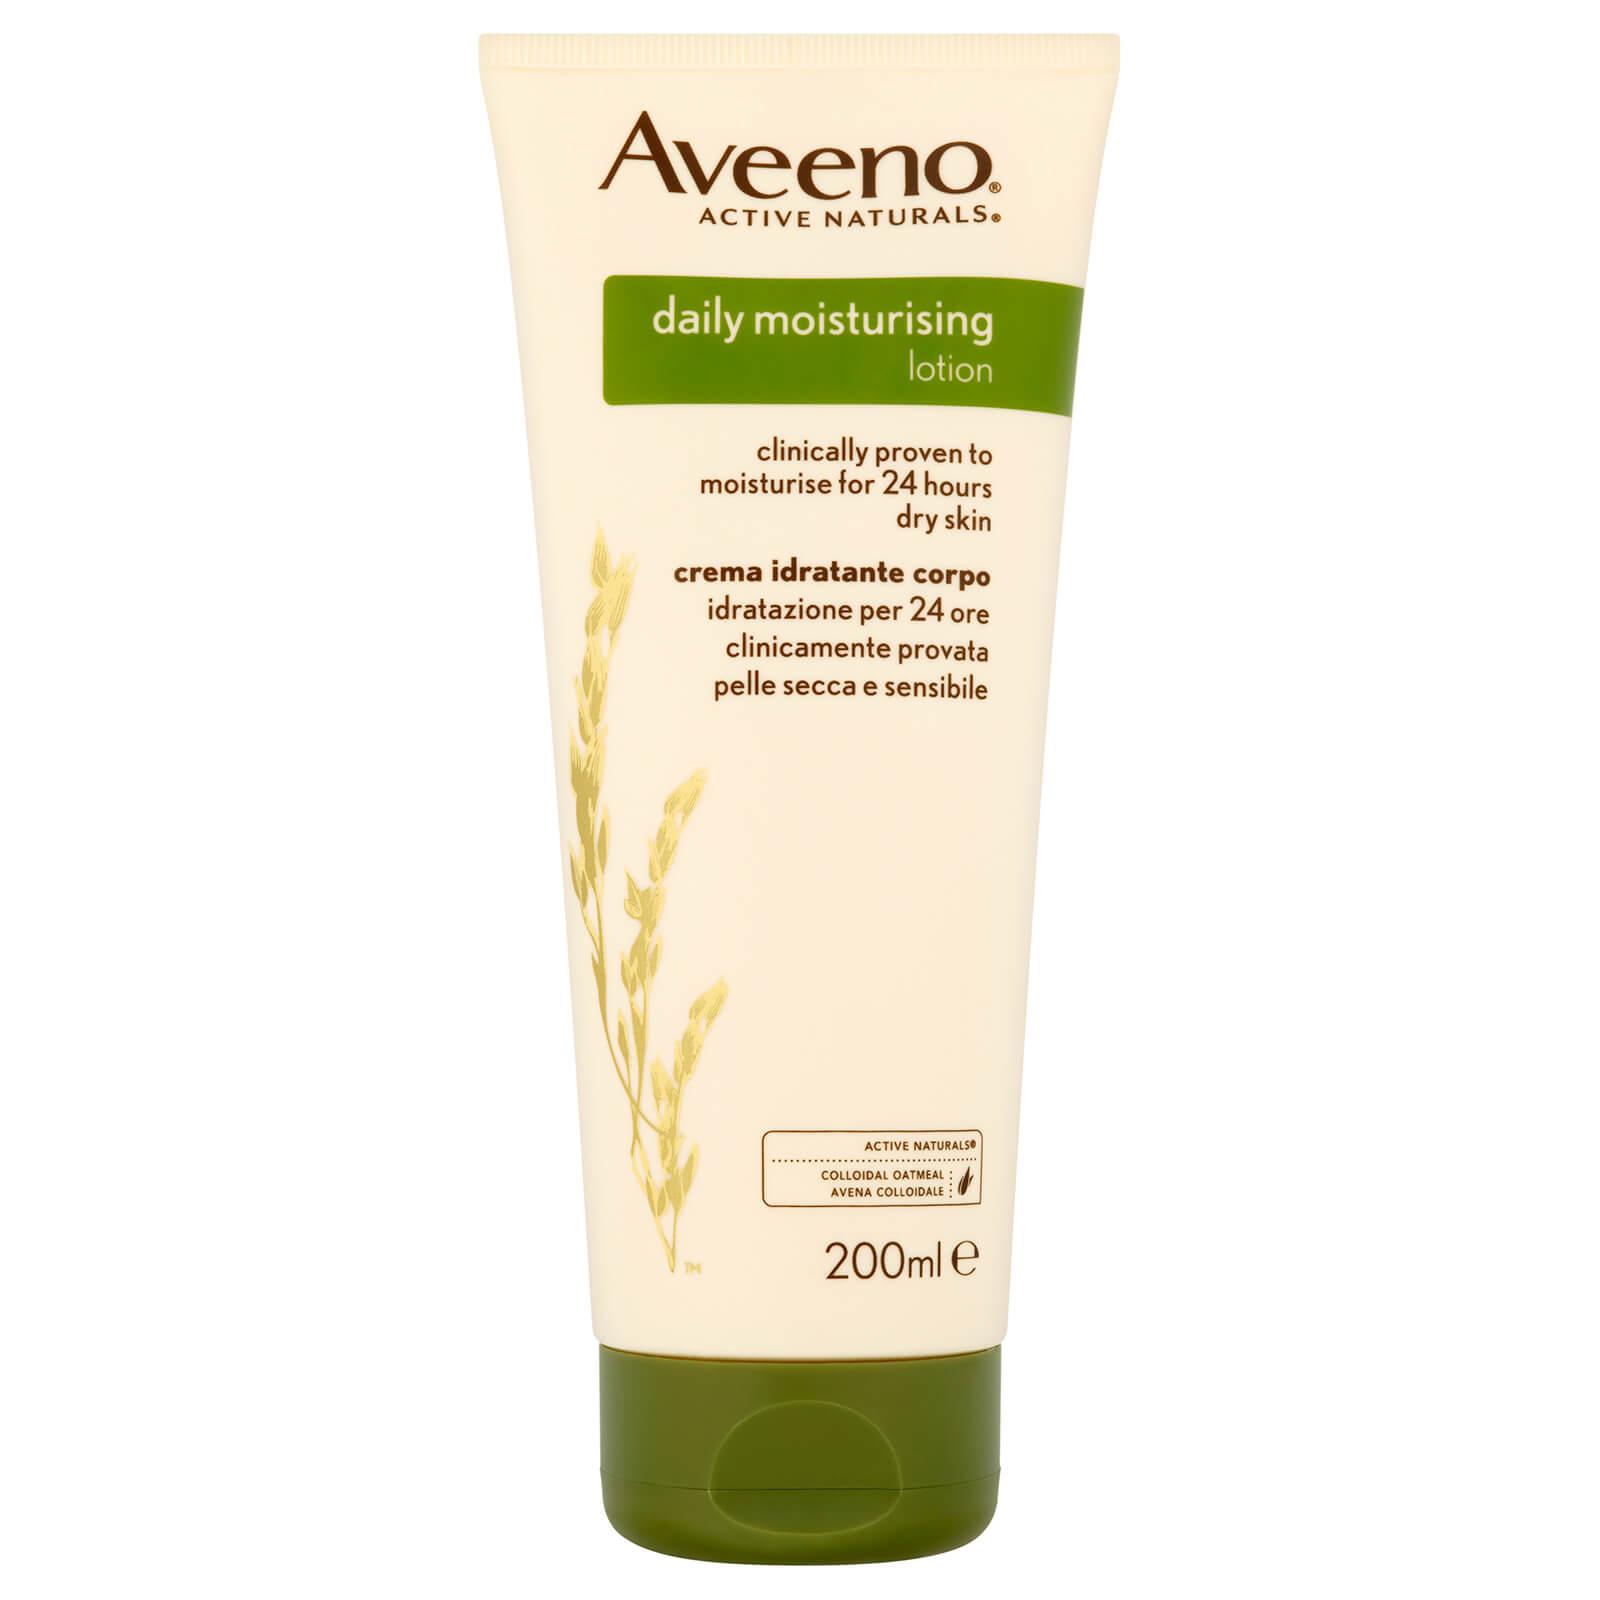 Aveeno daily moisturising lotion 200ml £3.75 @ Asda